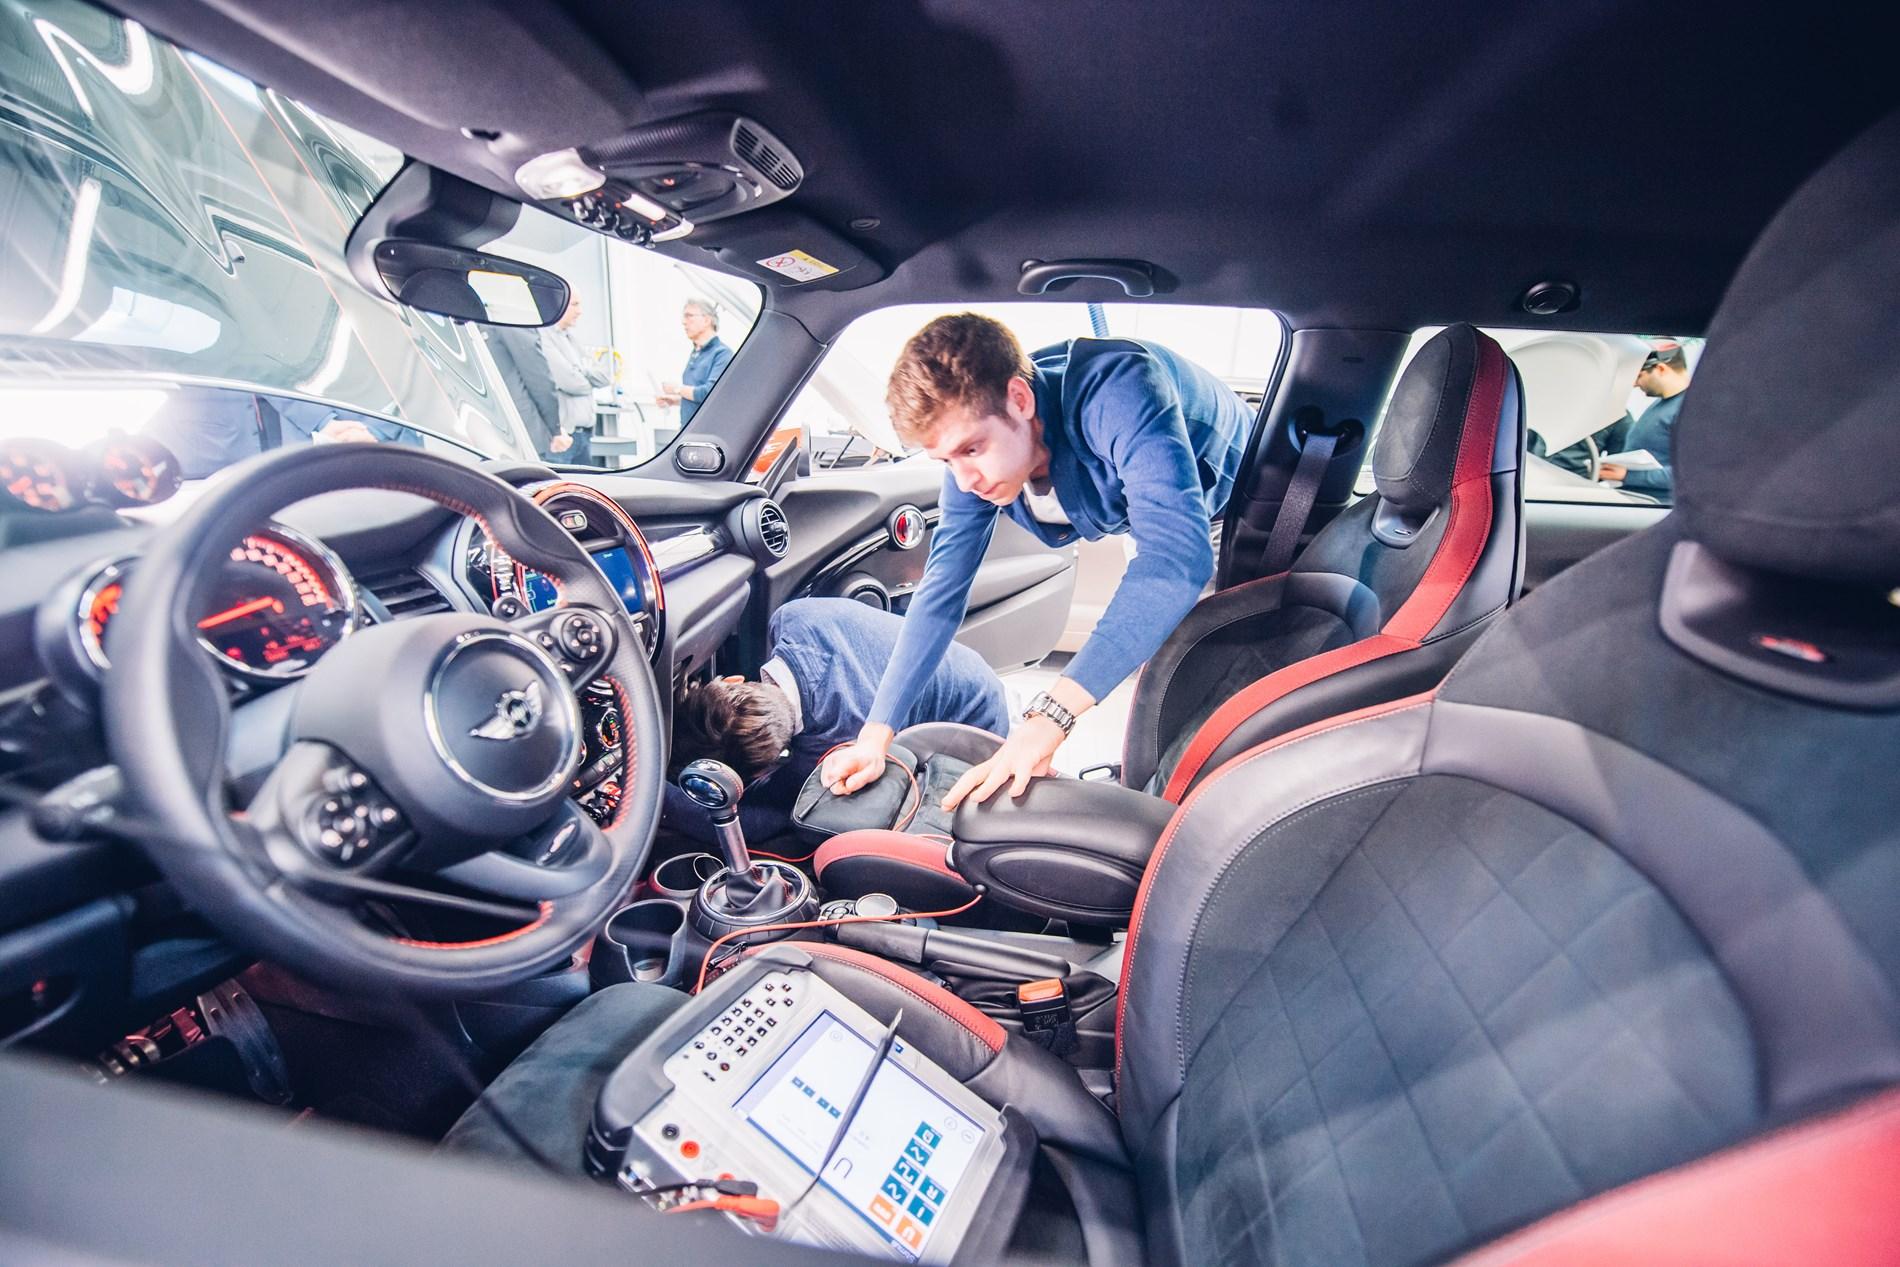 Thomas More en BMW Group zetten samen auto-opleidingen in hogere versnelling.